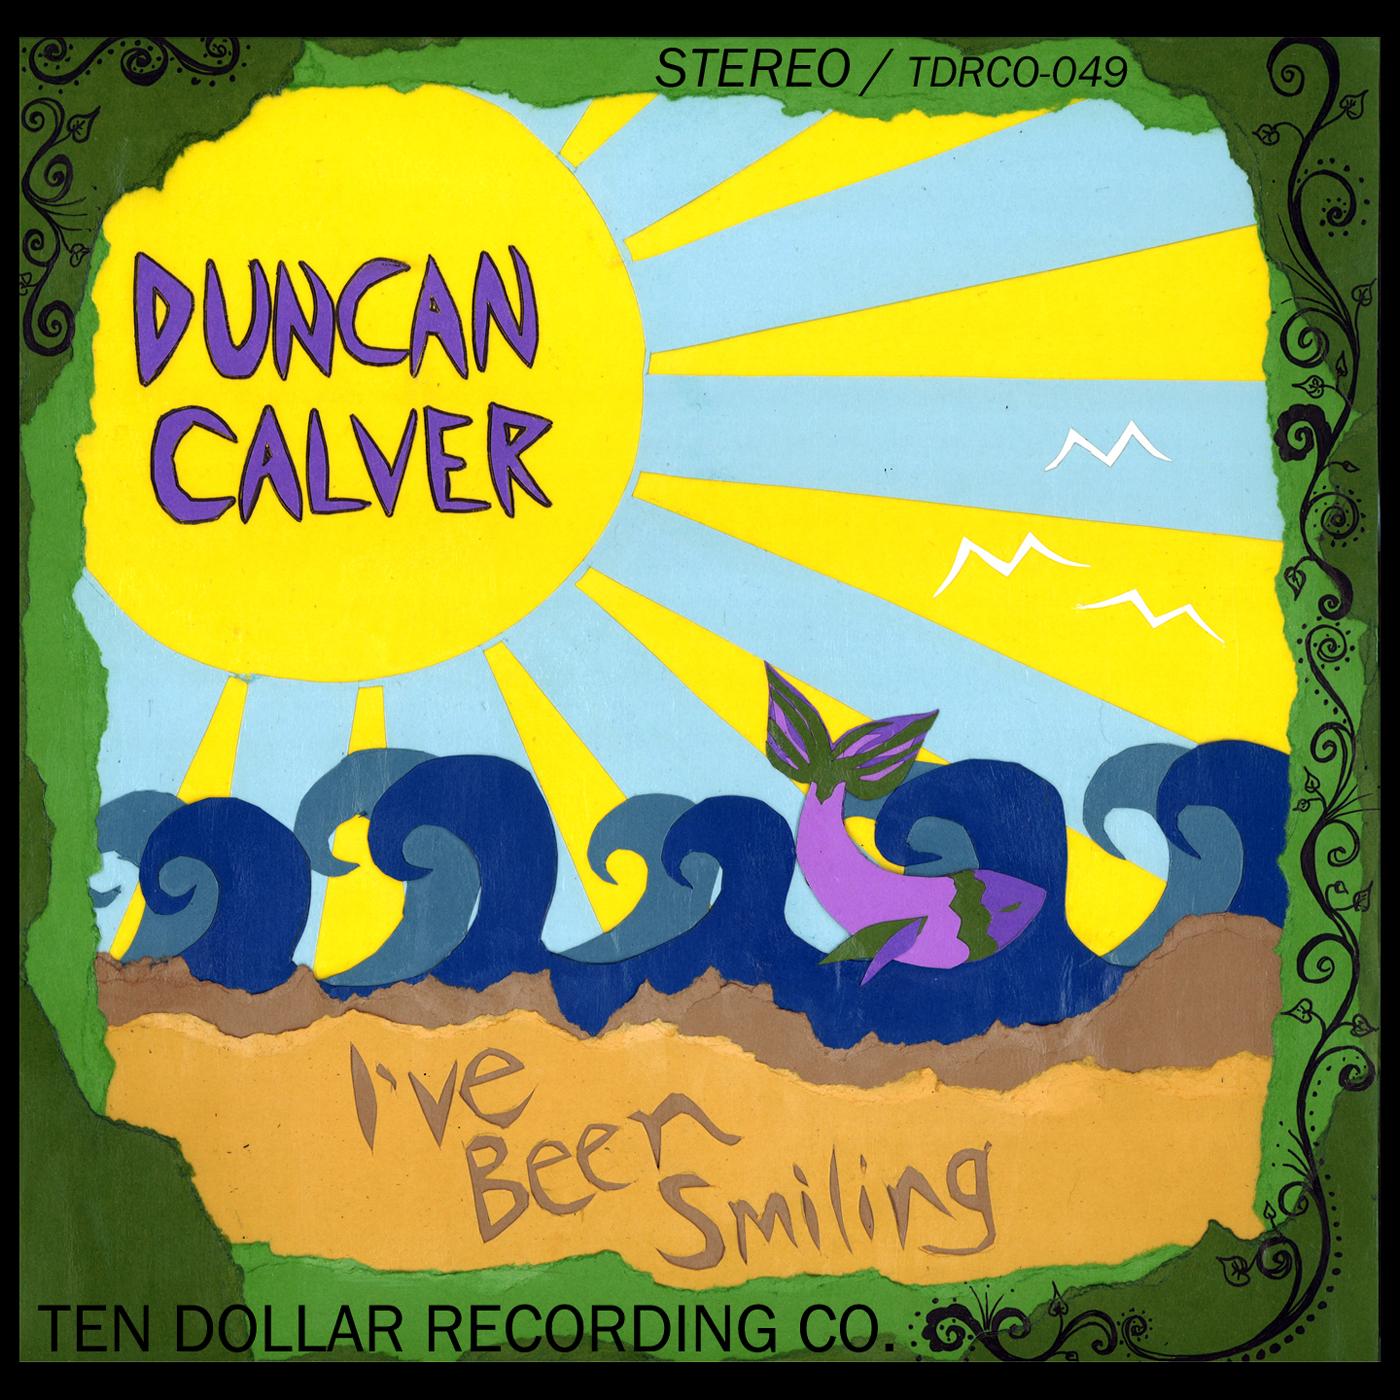 Duncan Calver - I've Been Smiling (Single)